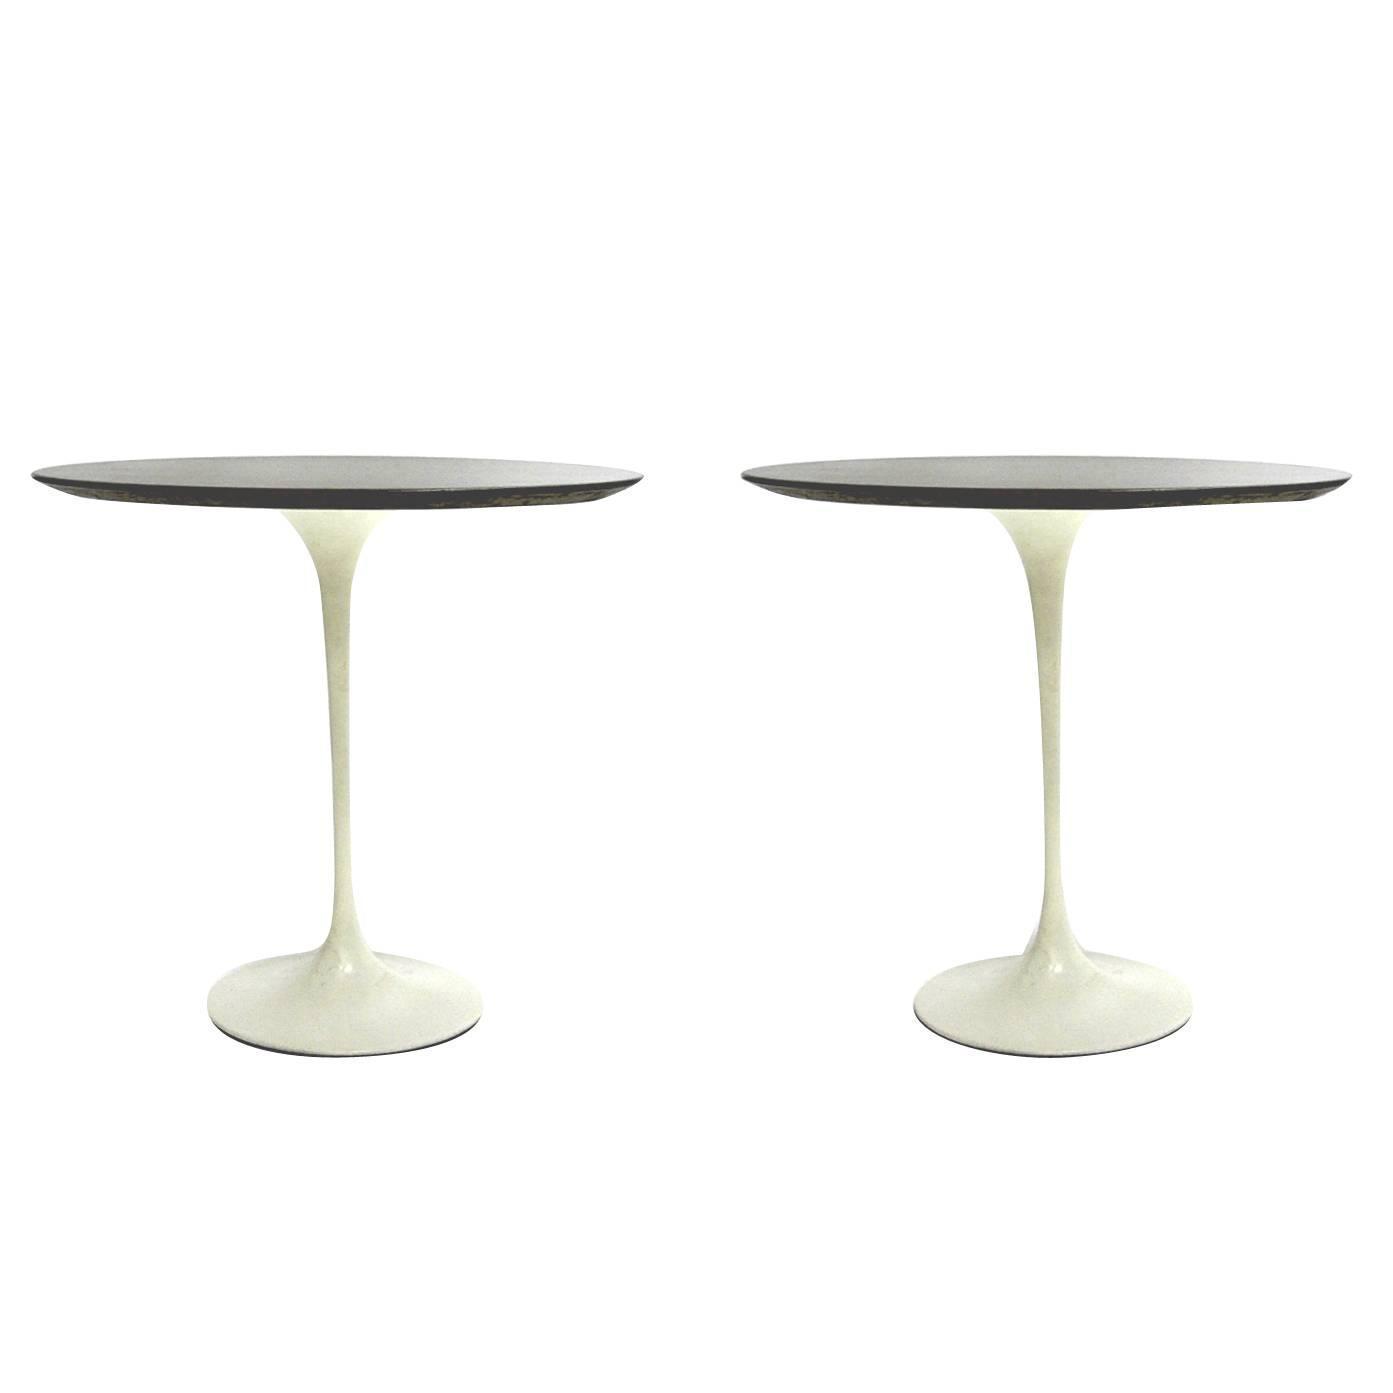 Revgercom Table Knoll Ovale Vintage Id233e inspirante  : saarpairoval2orgz from revger.com size 1393 x 1393 jpeg 23kB